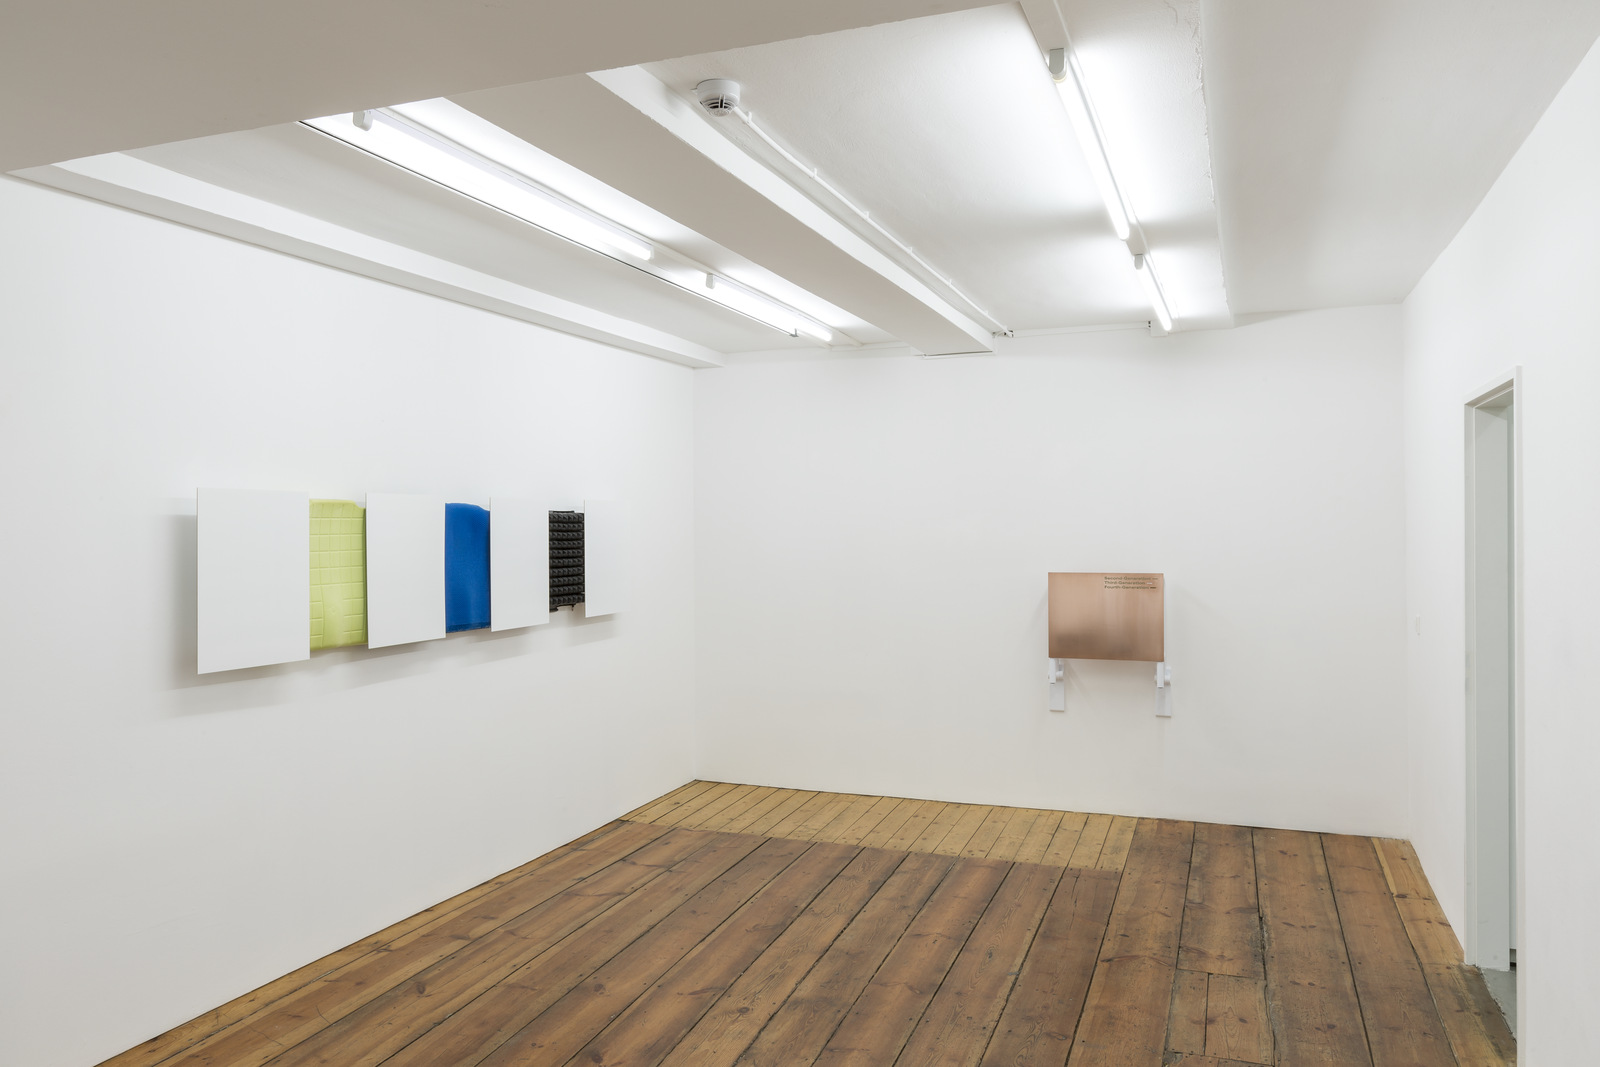 Matthias_Sohr_ACUD_gallery_05_installation_view